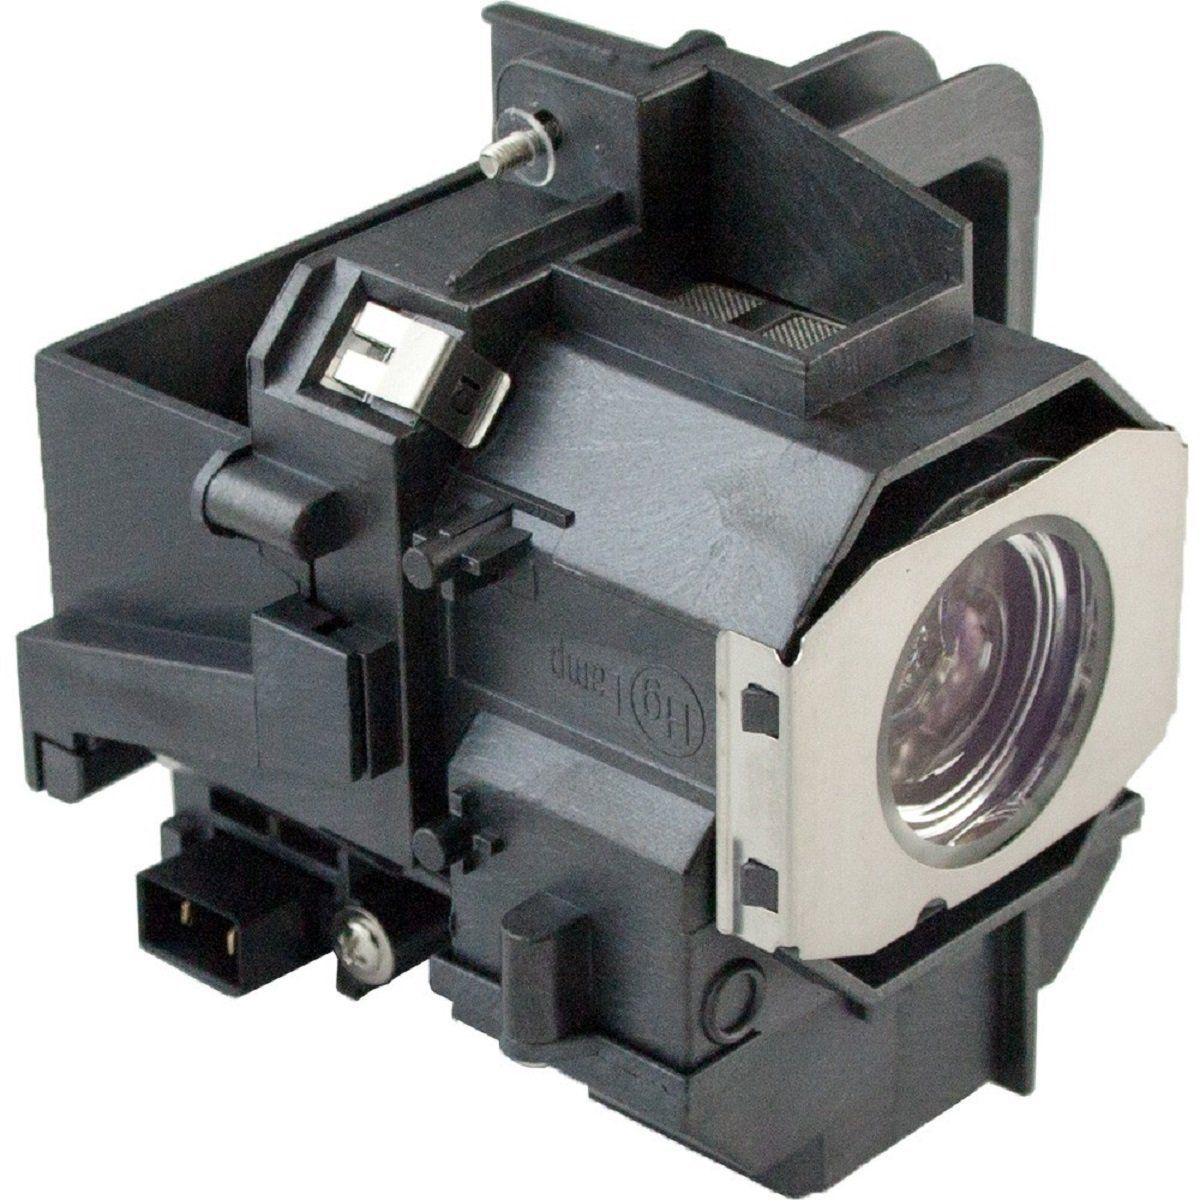 Original Osram PVIP Lamp U0026 Housing For The Epson Powerlite Home Cinema 8350  Projector   180